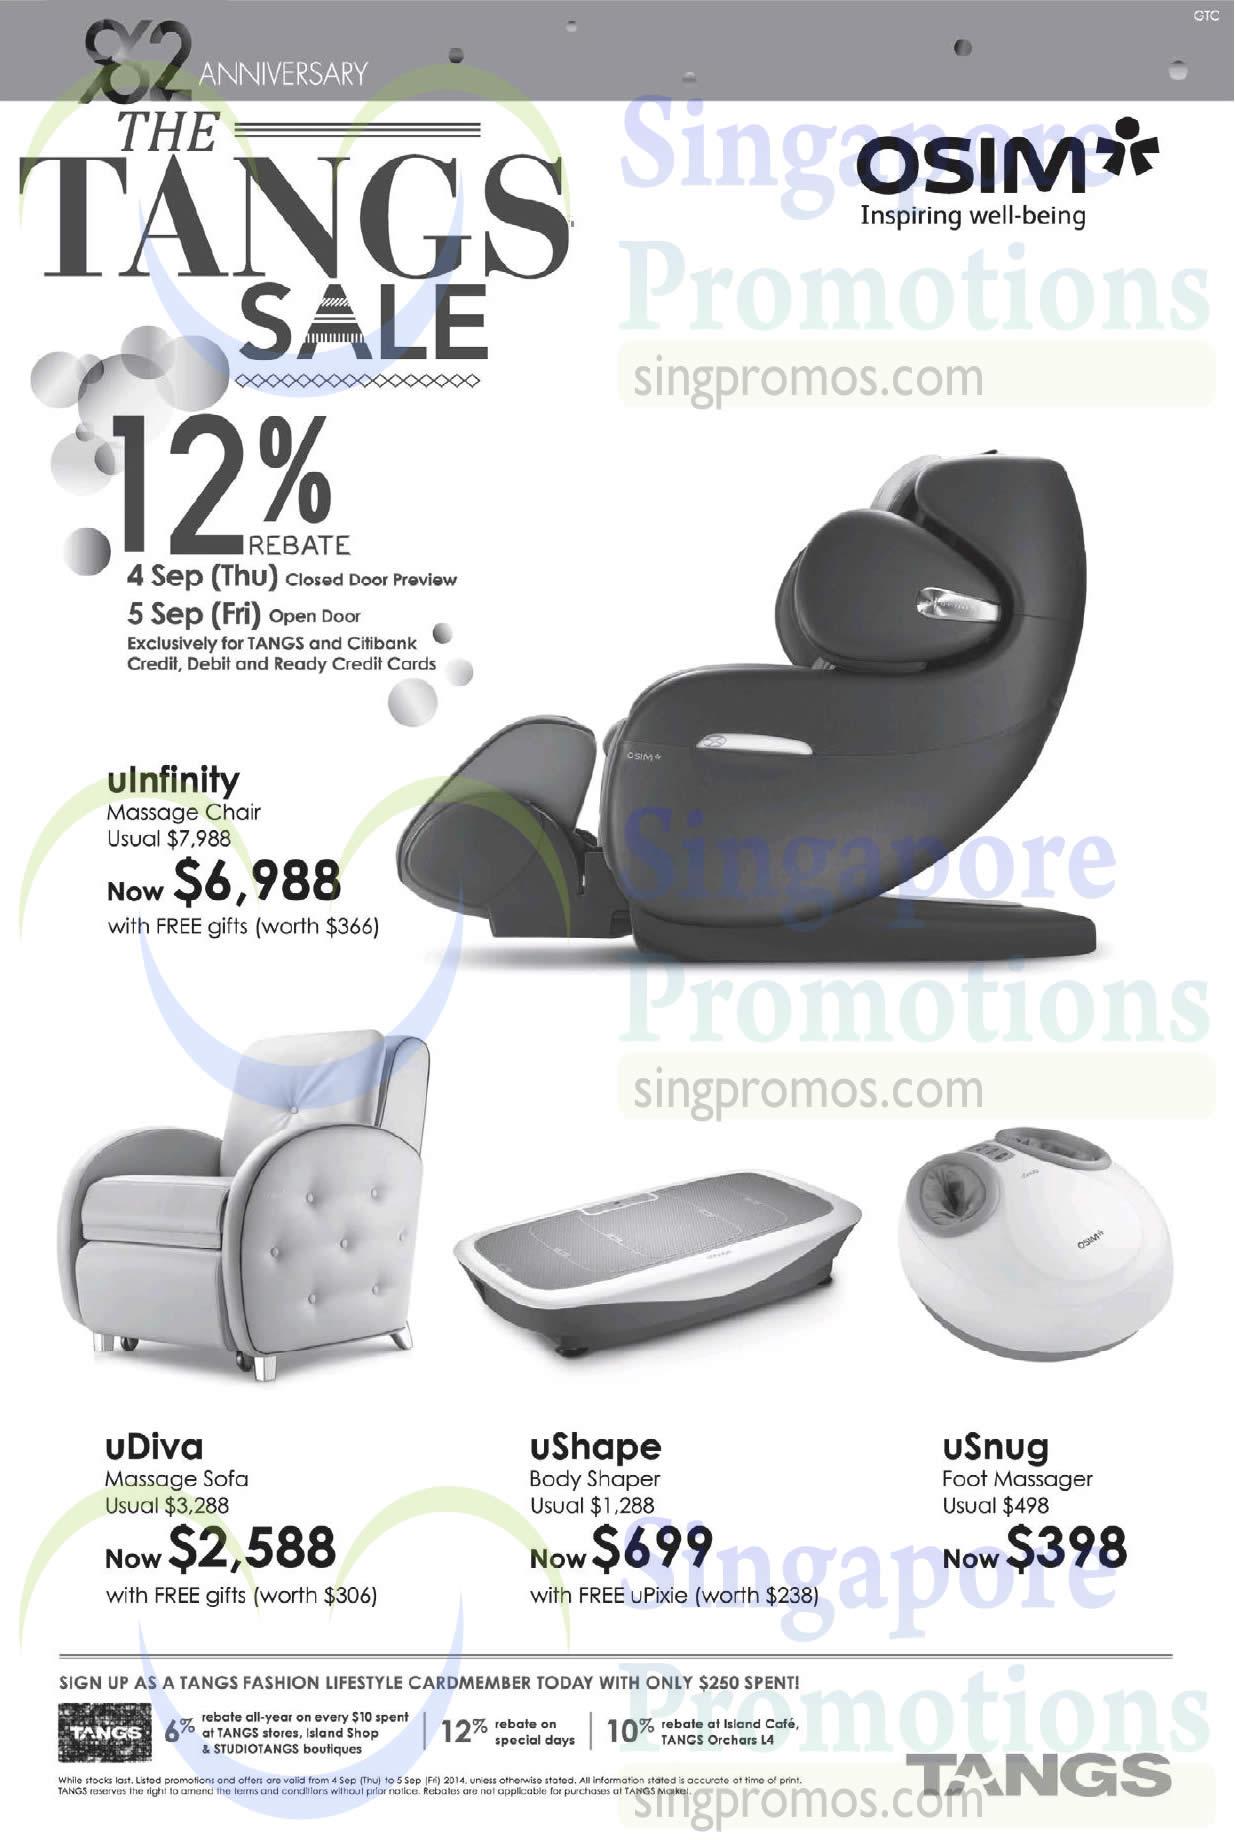 Osim massage chair price - Osim Massage Chair Price